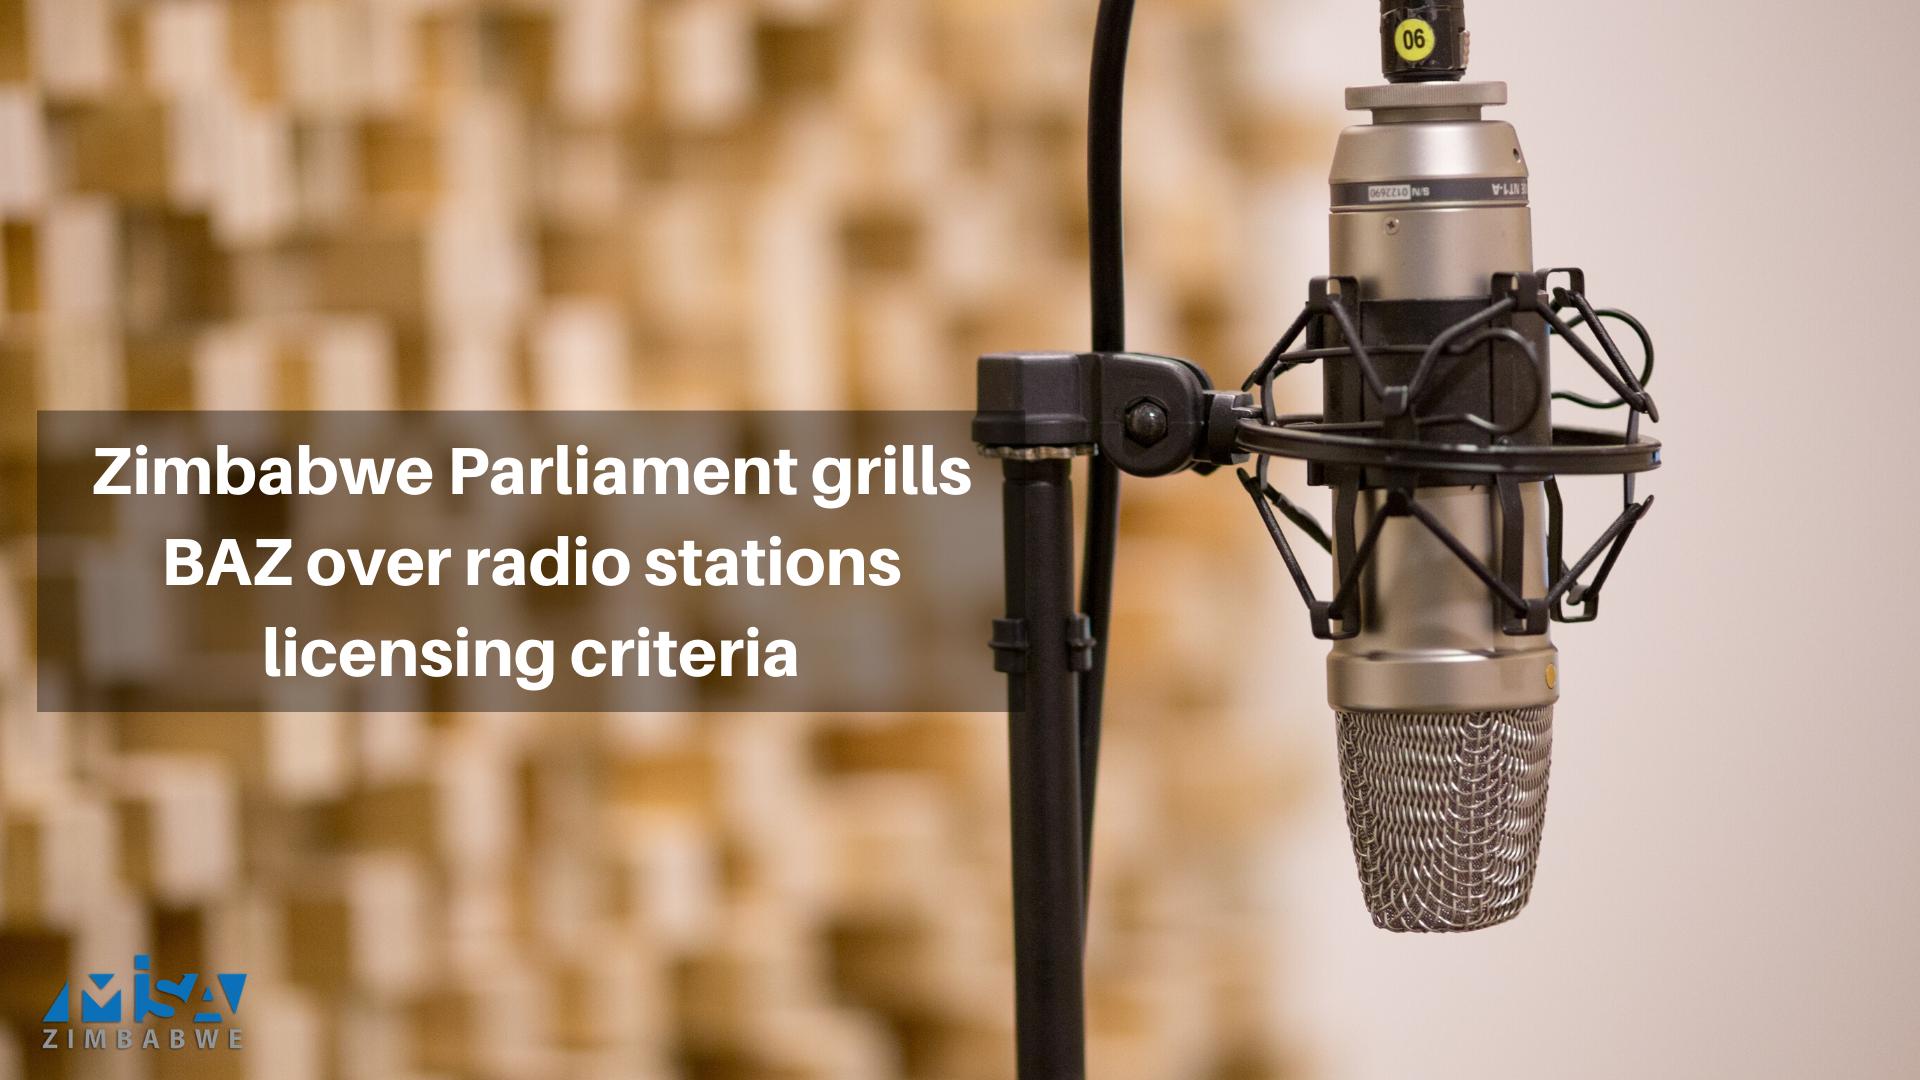 Zimbabwe Parliament grills BAZ over radio stations licensing criteria